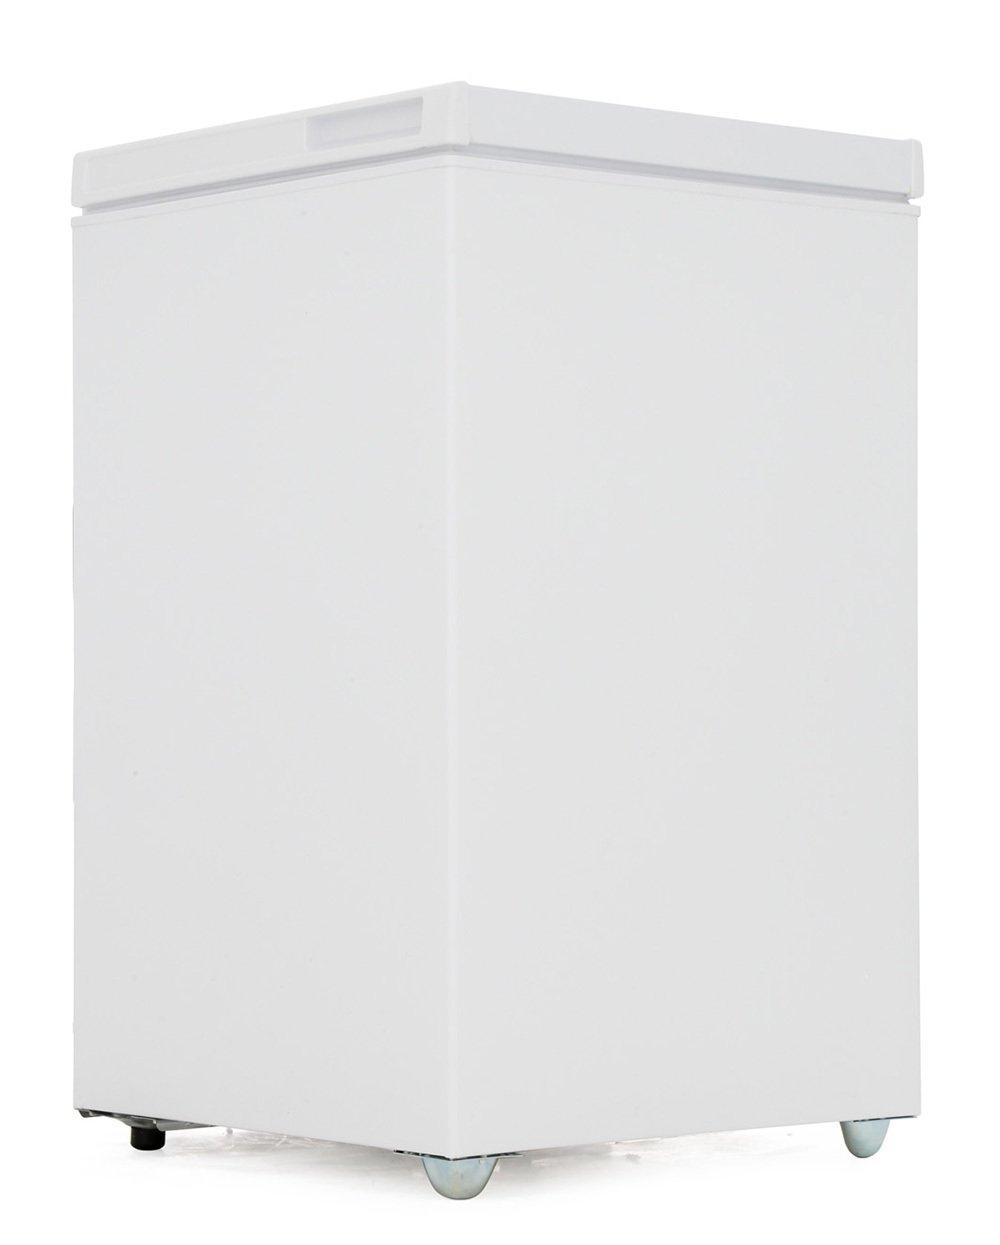 Indesit OS1A1002UK.1 Chest Freezer